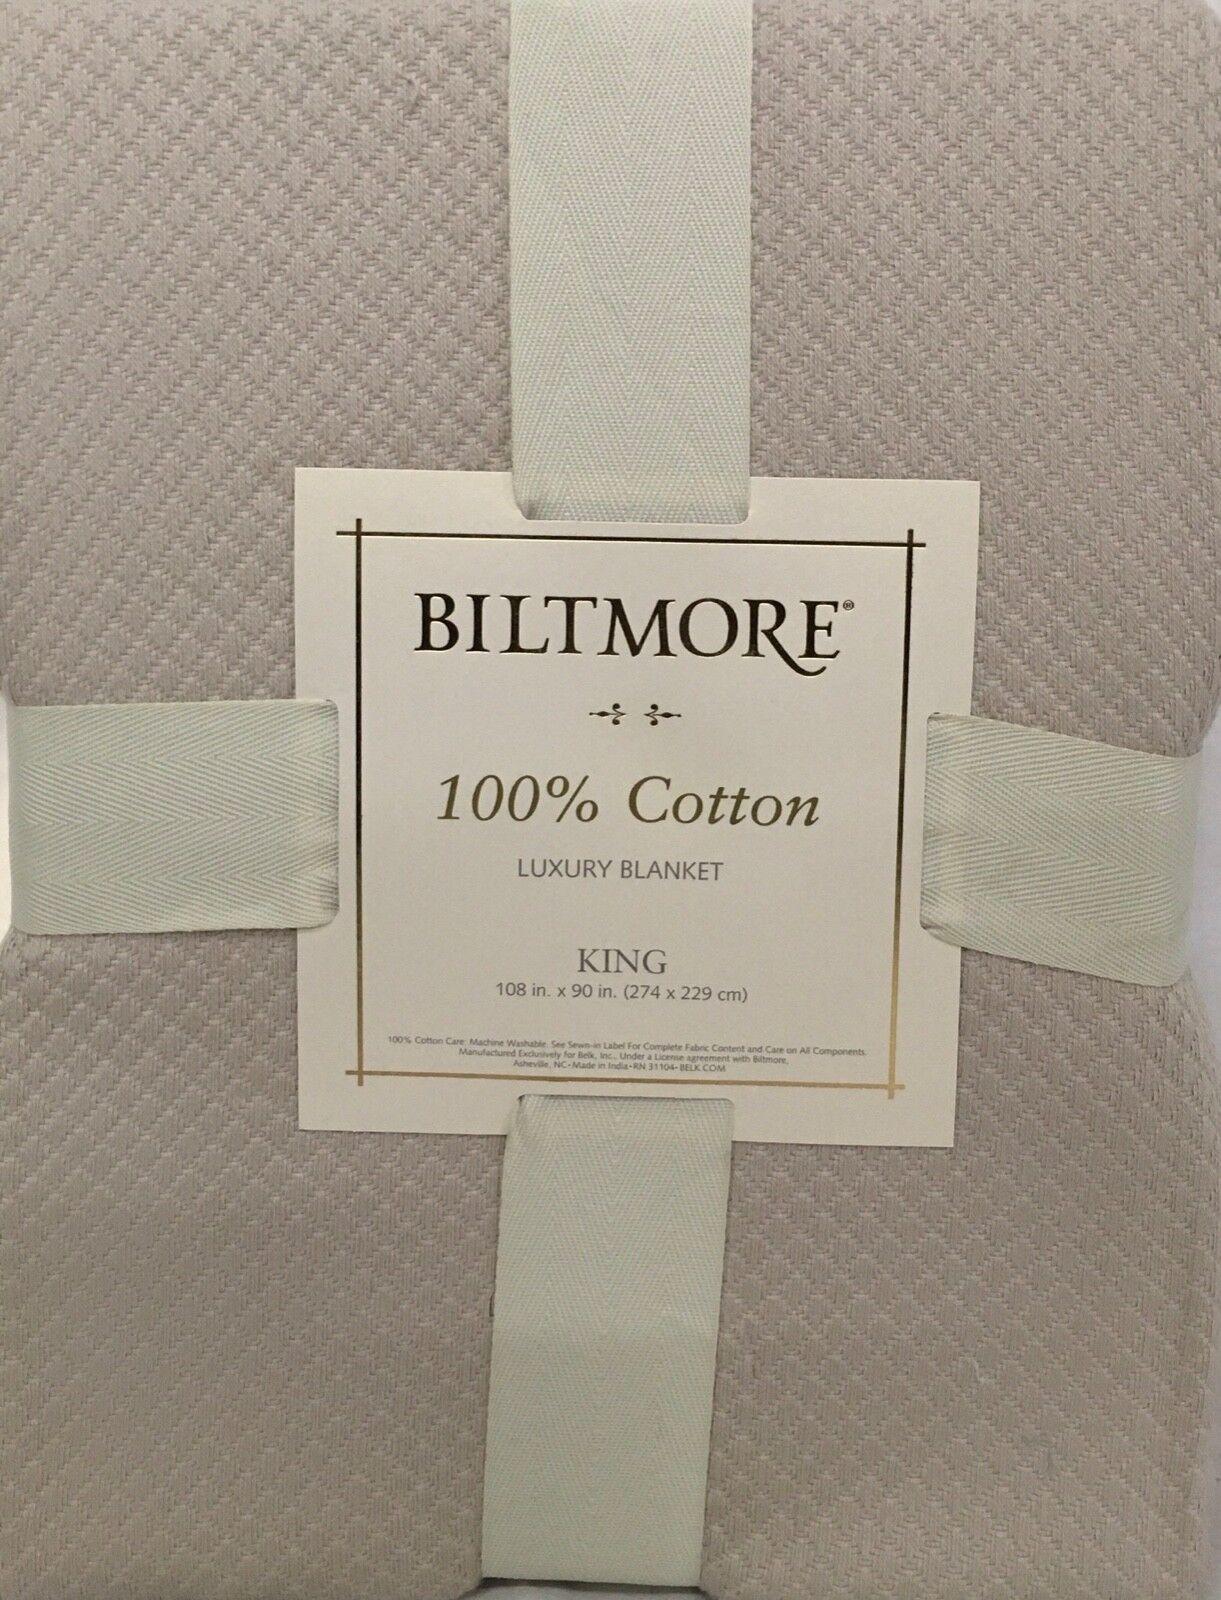 Biltmore Cotton Blanket KING - Koala Khaki